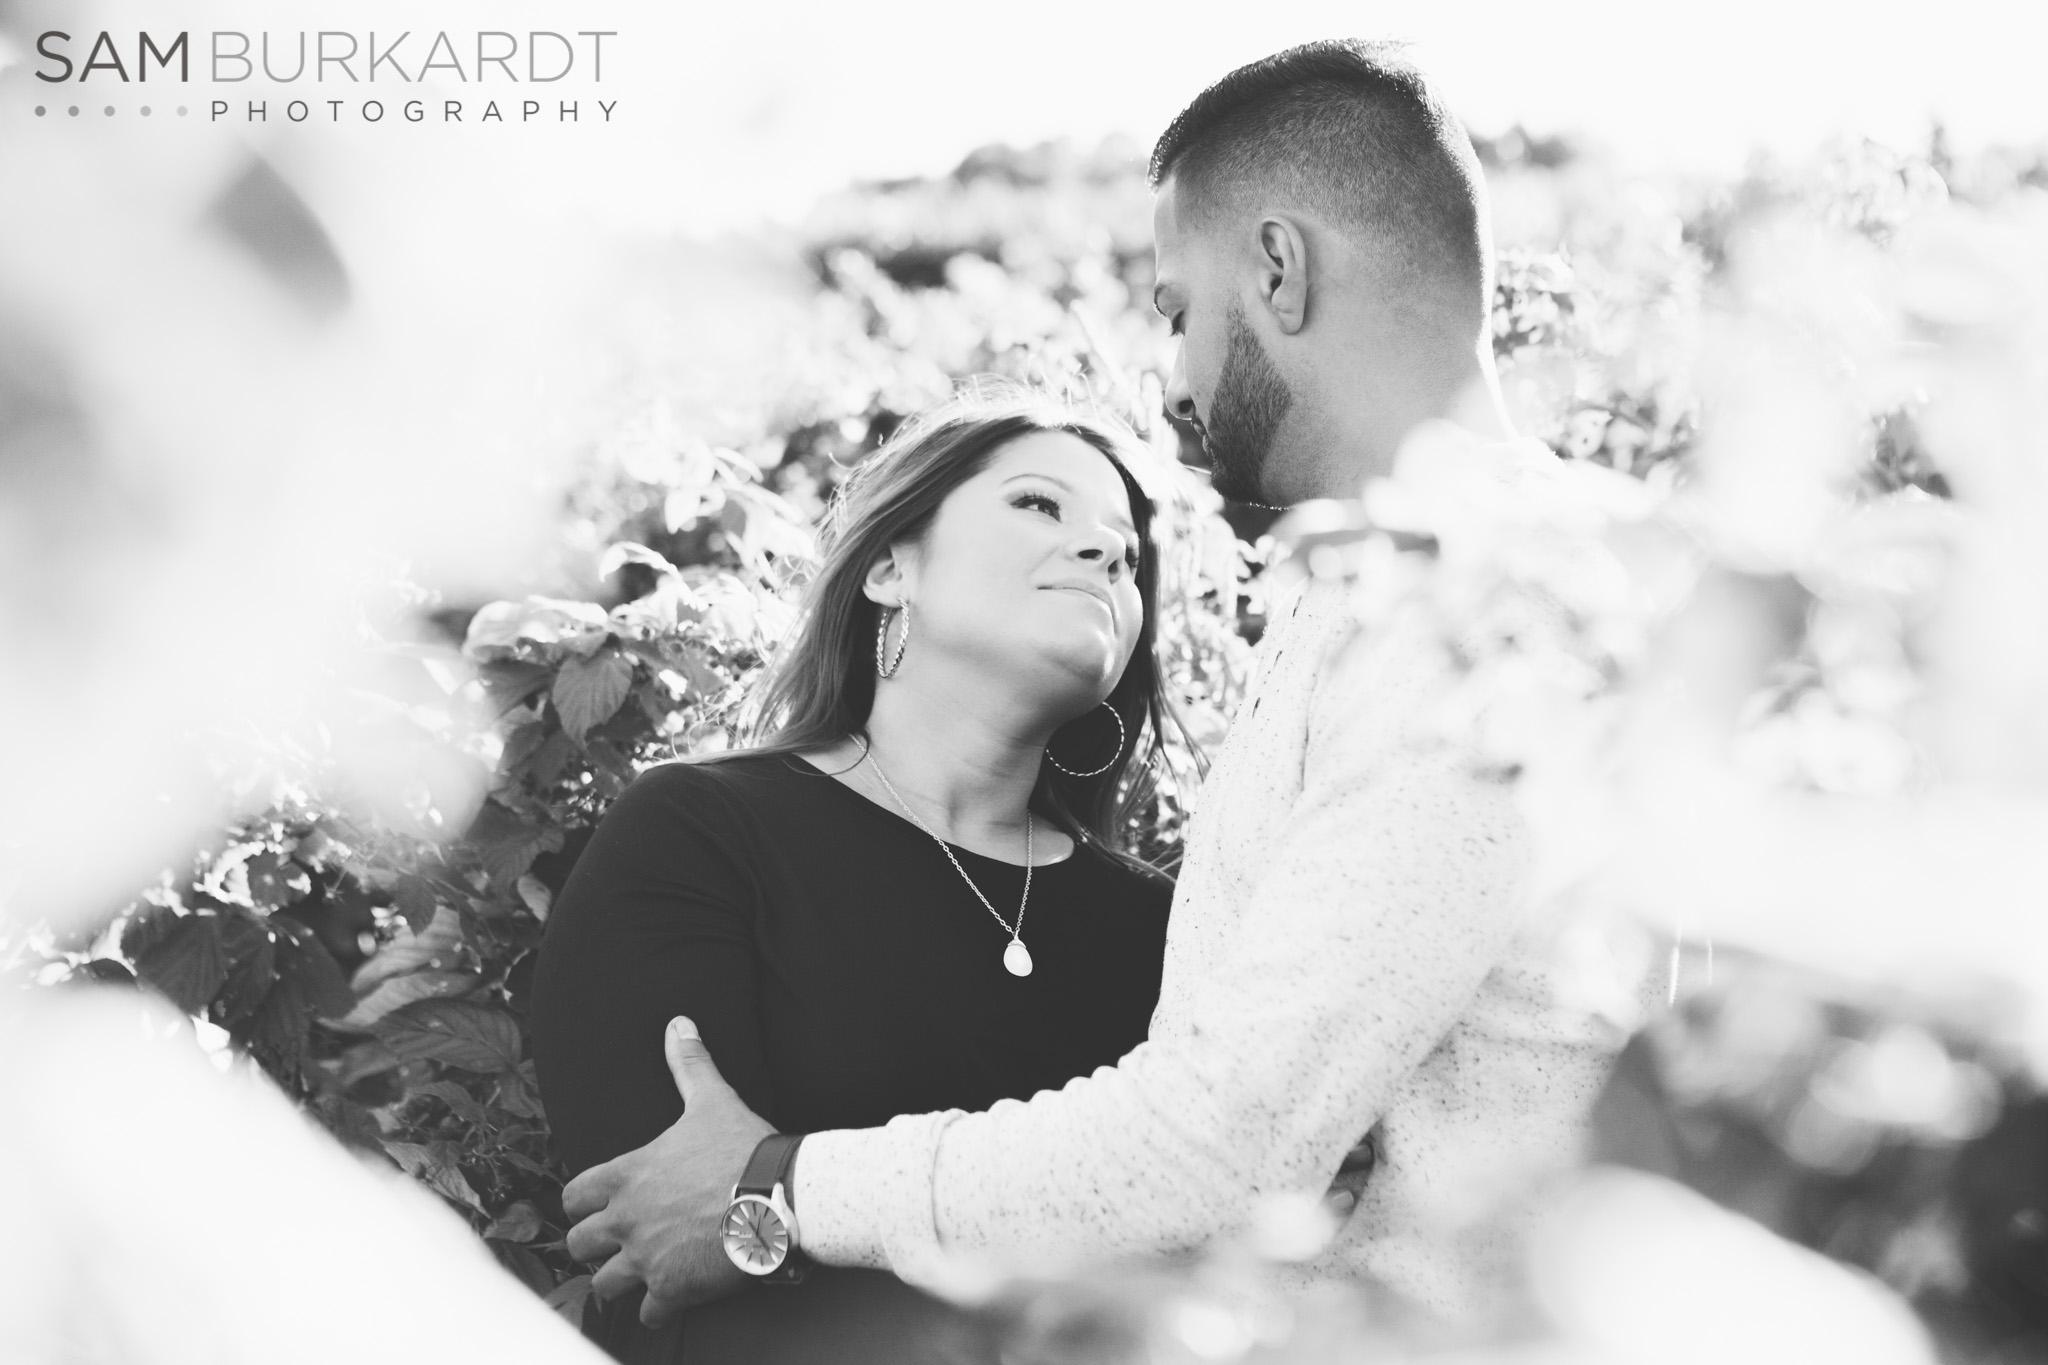 sburkardt_maternity_connecticut_fall_orchard_photography_022.jpg